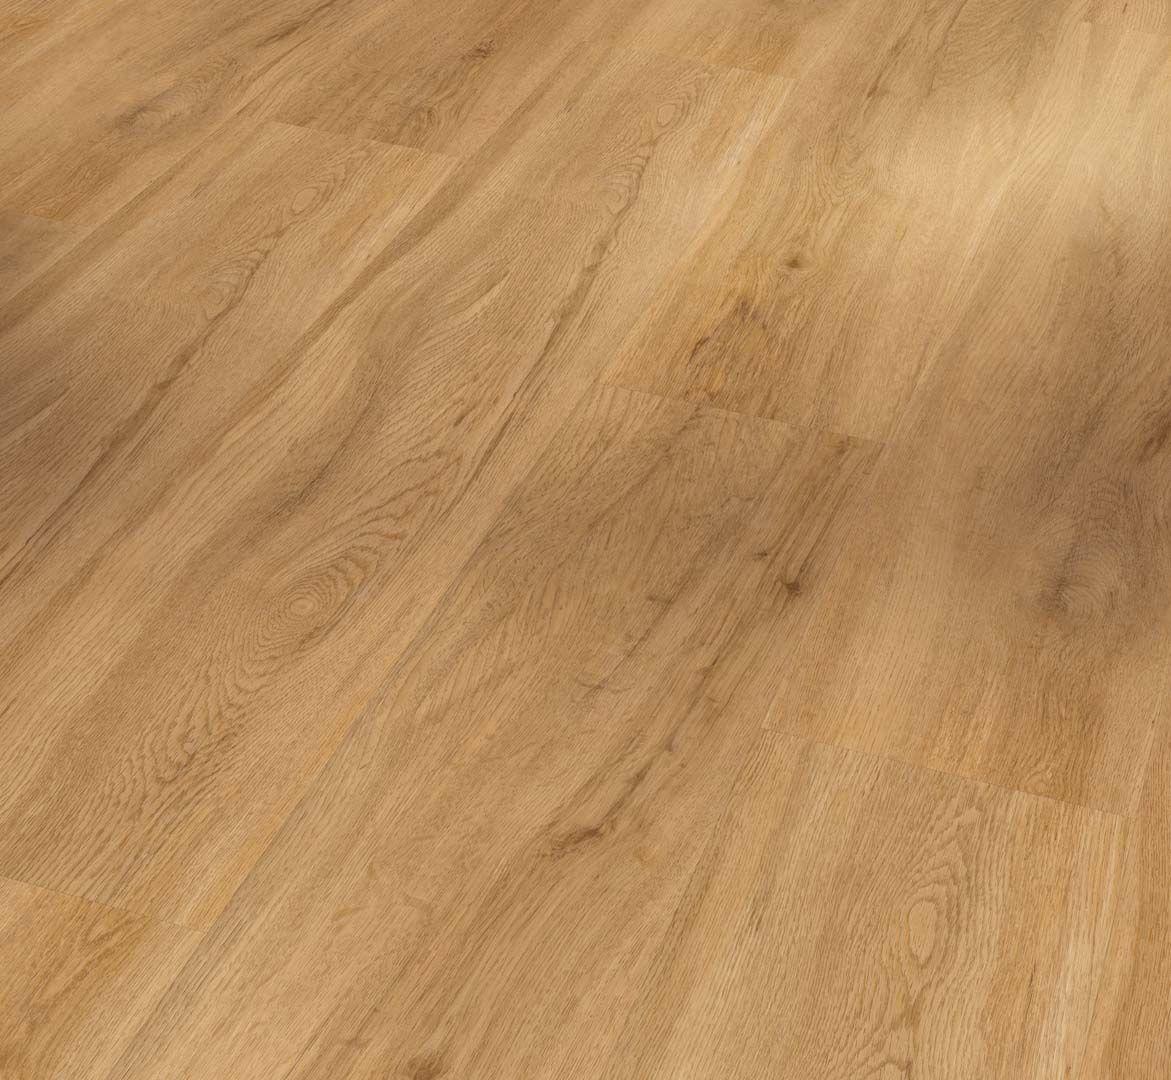 Oak Sierra natural